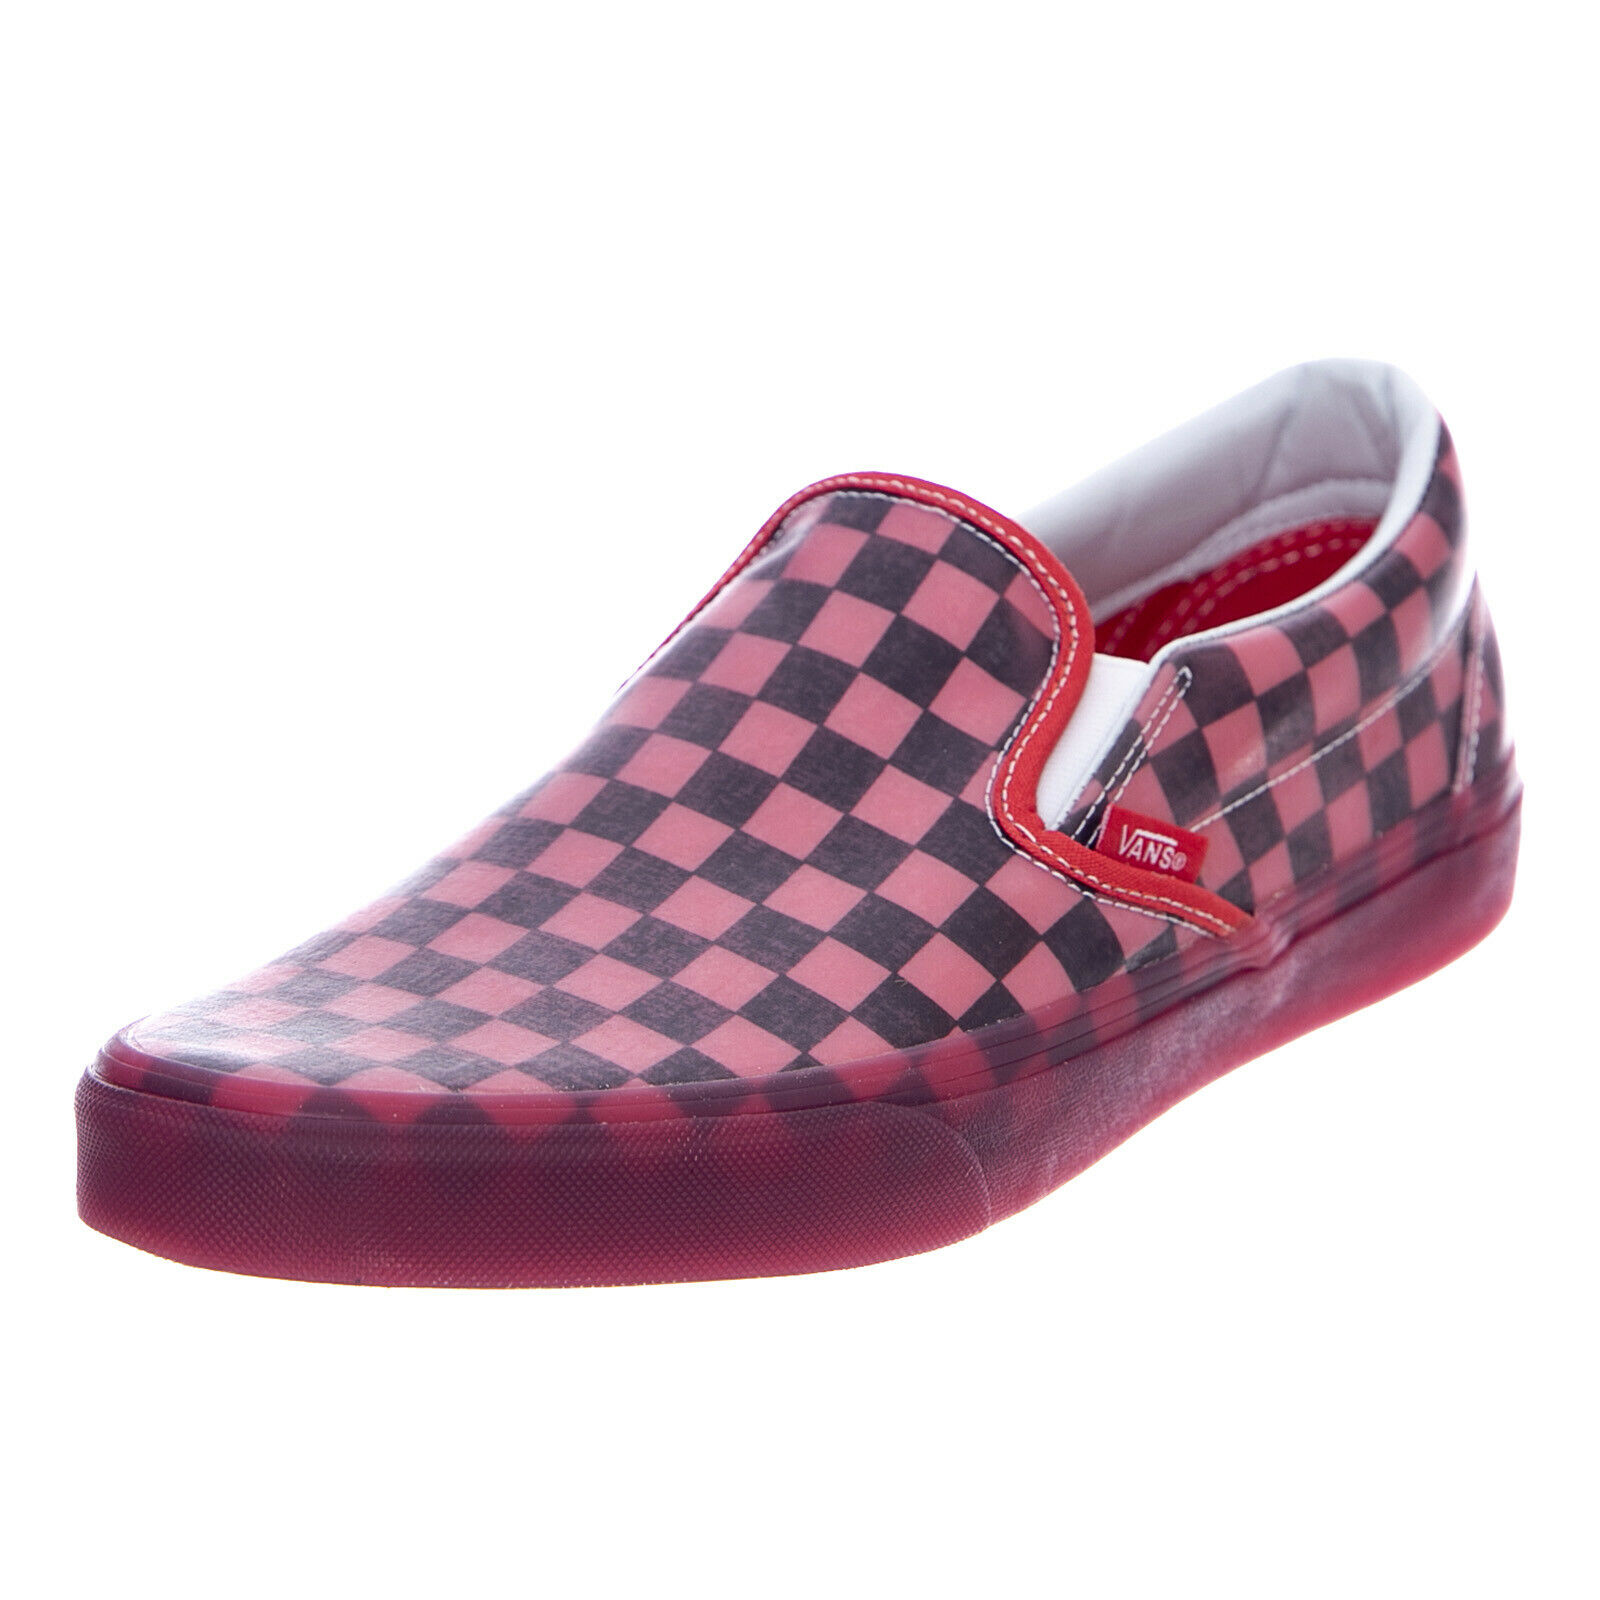 0b77f5d9111c9a Vans Classic Slip-On Translucent Rubber - Hibi Pink - Slip-On Low Man